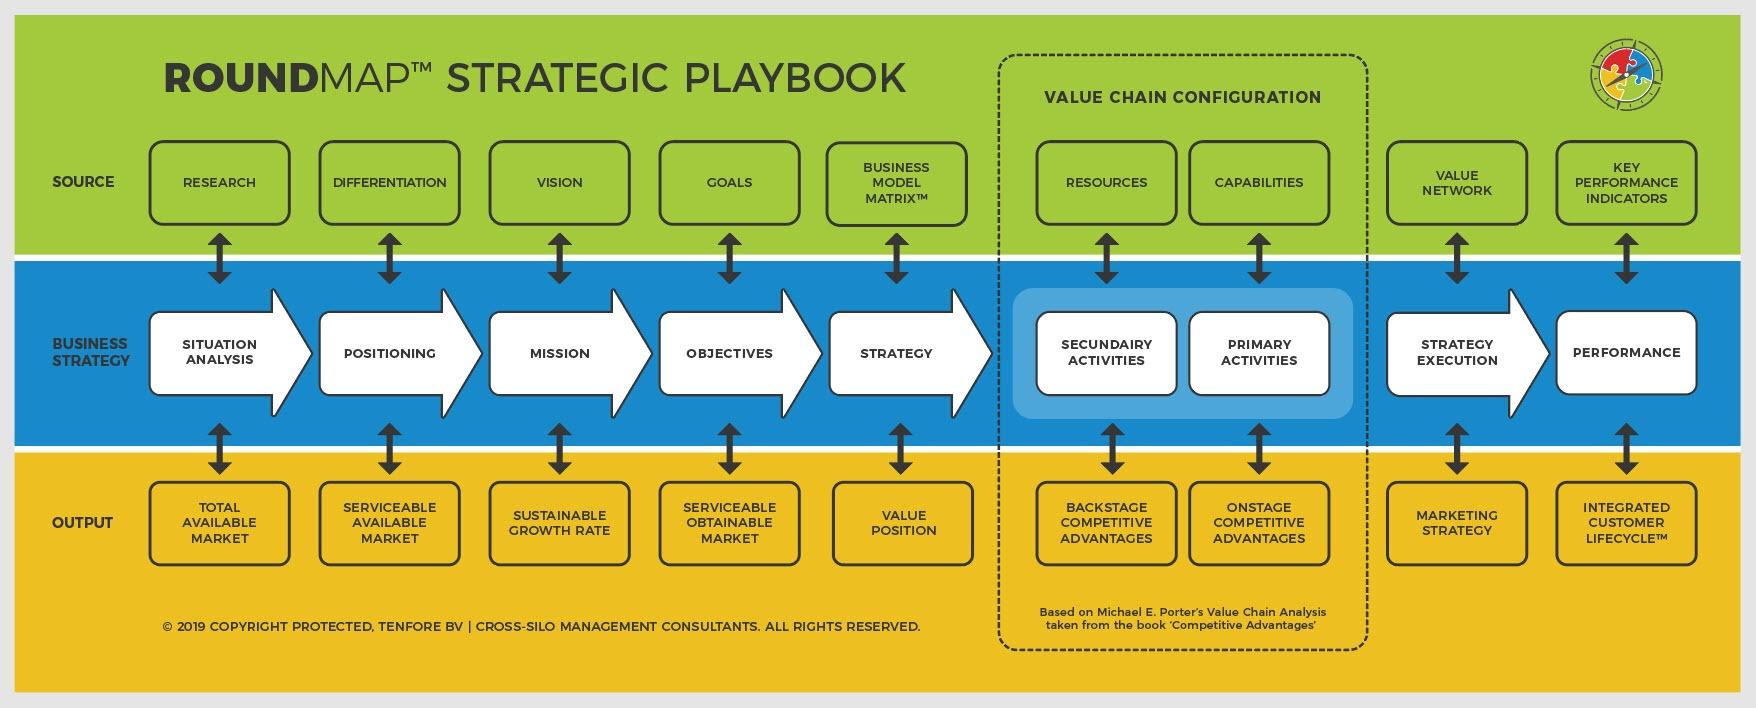 ROUNDMAP-Strategic-Playbook